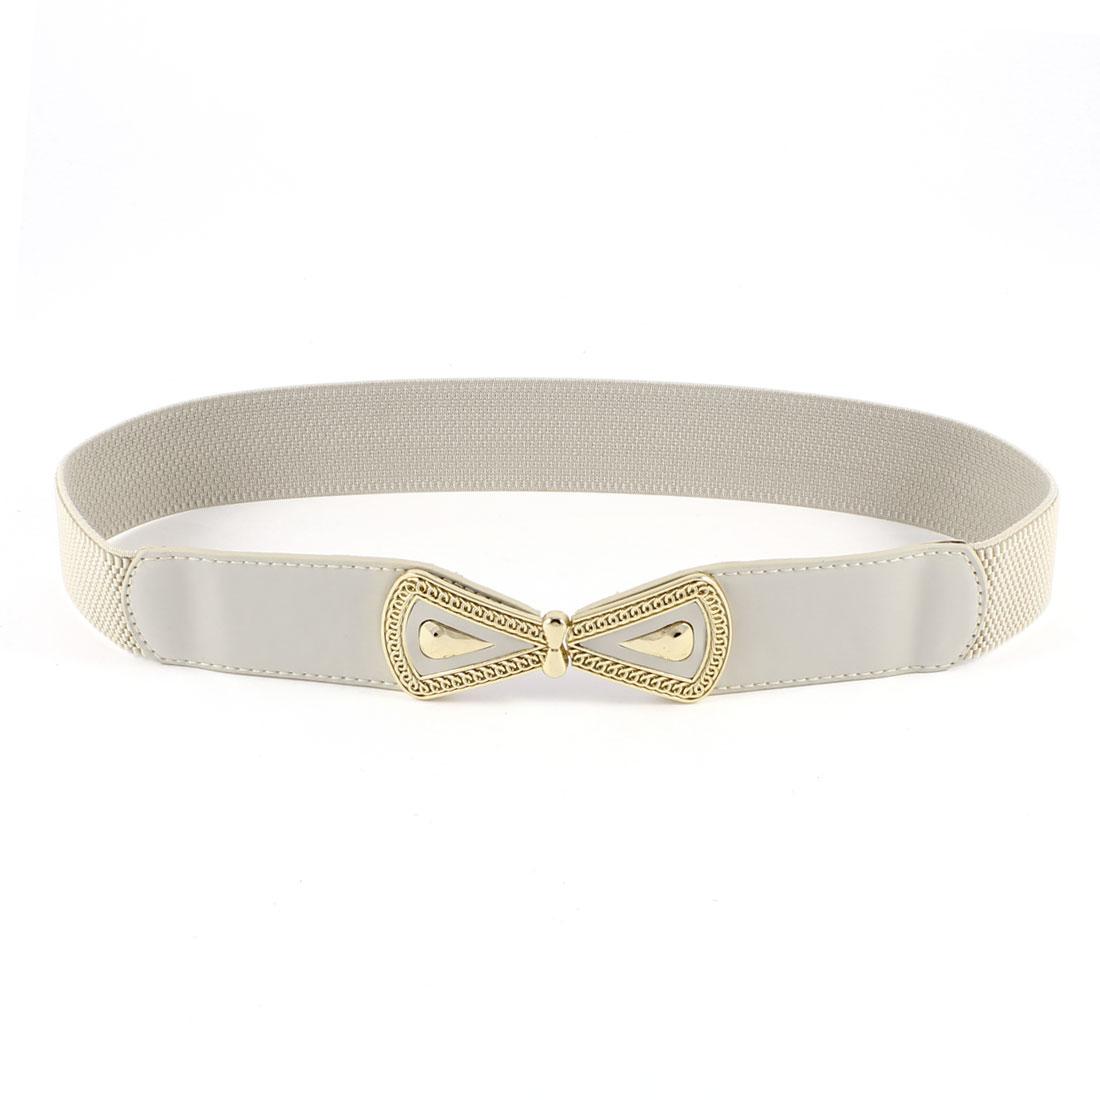 Light Khaki Stretchy Thin Skinny Waistband Cinch Waist Belt 4CM Wide for Women